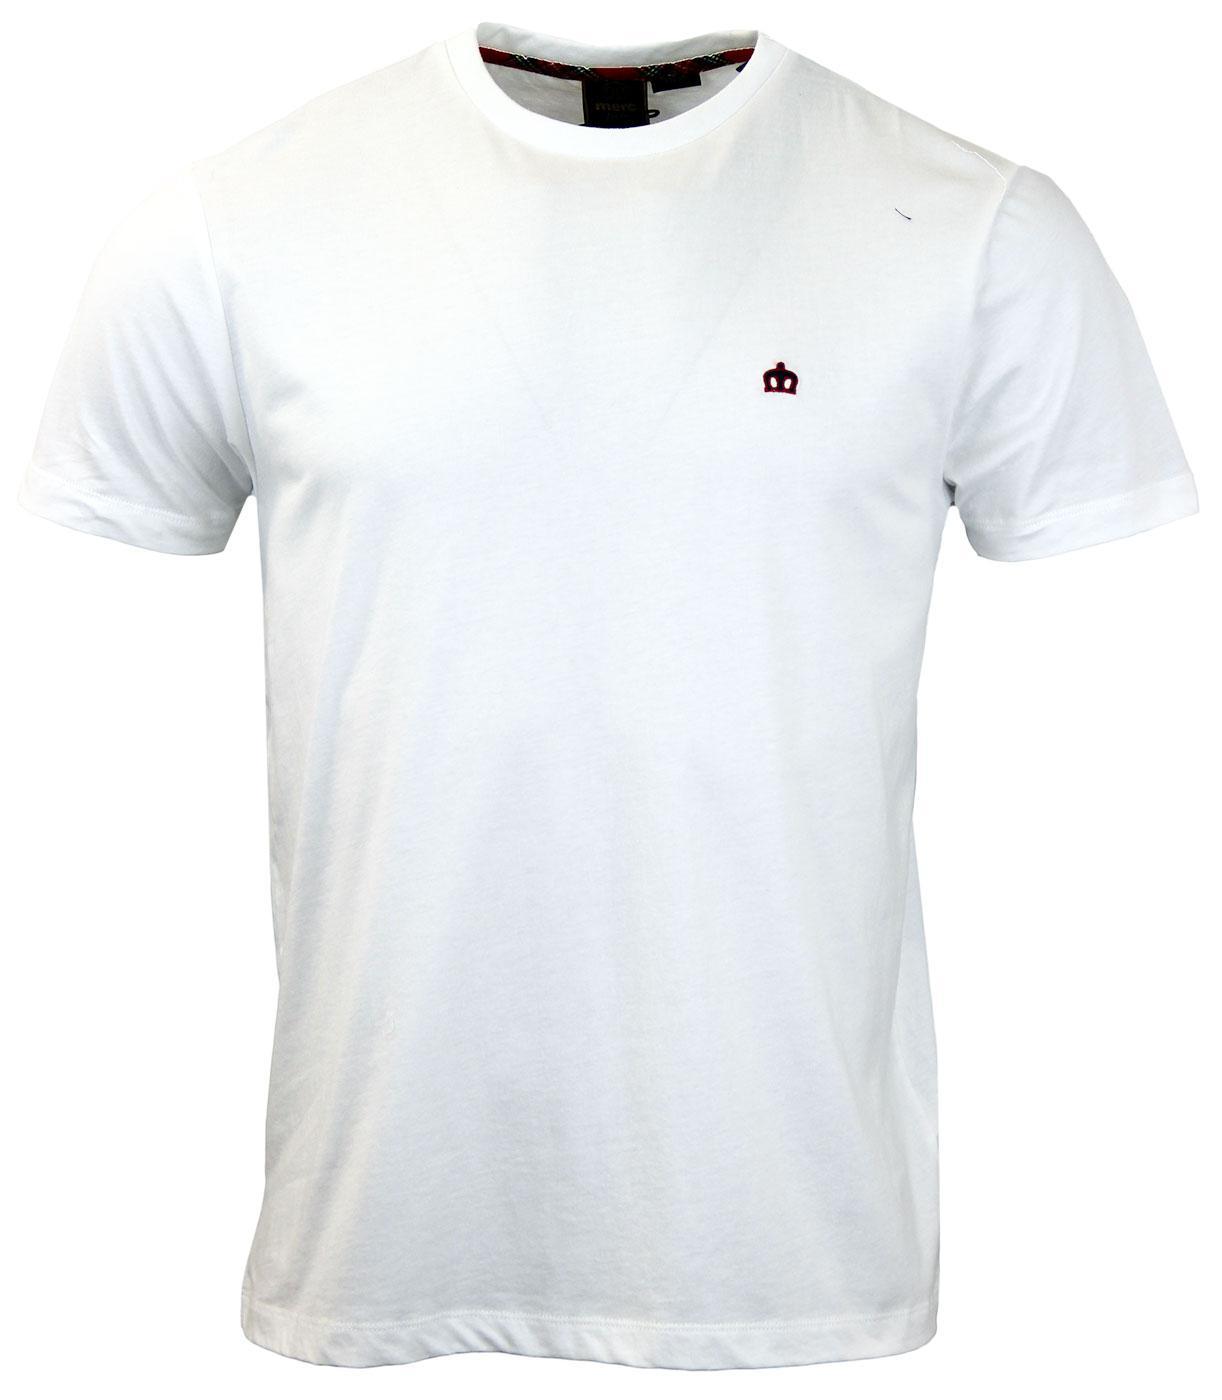 Keyport MERC Retro Mod Plain Crew Neck T-Shirt OW